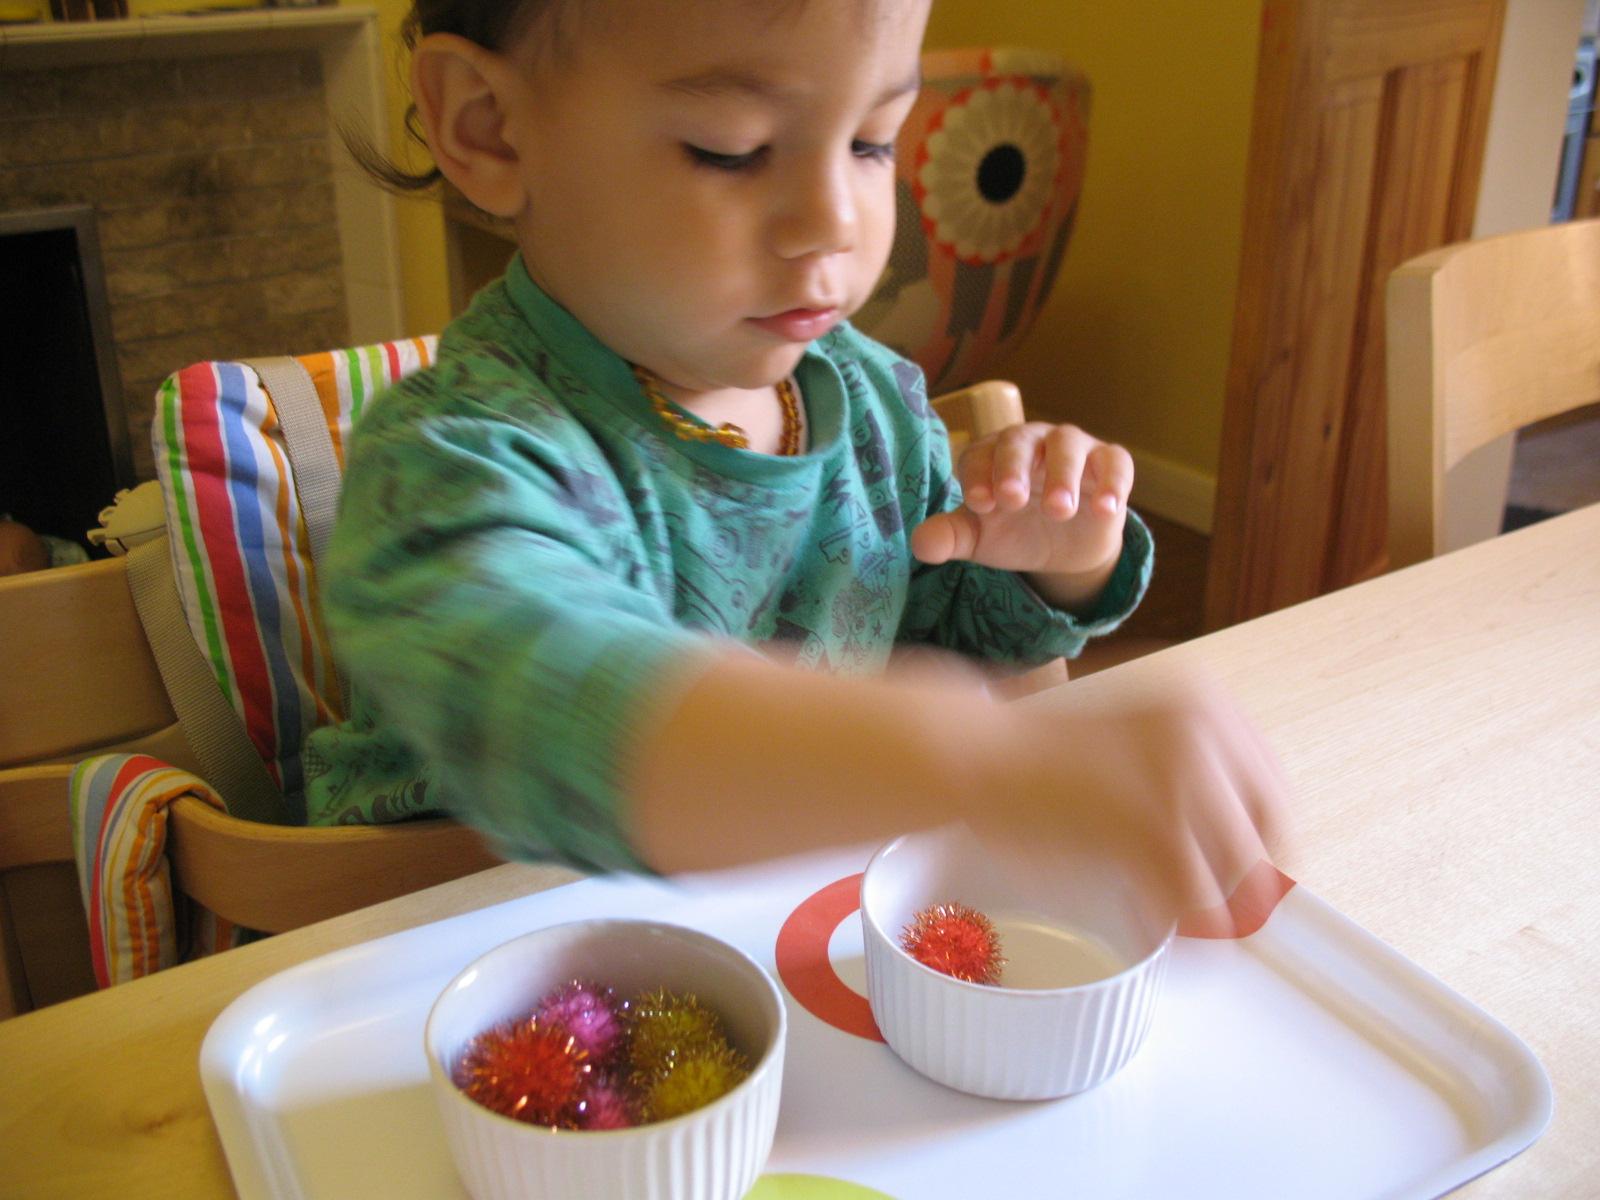 Smiling like sunshine montessori activities for toddlers 2 for Montessori fine motor skills